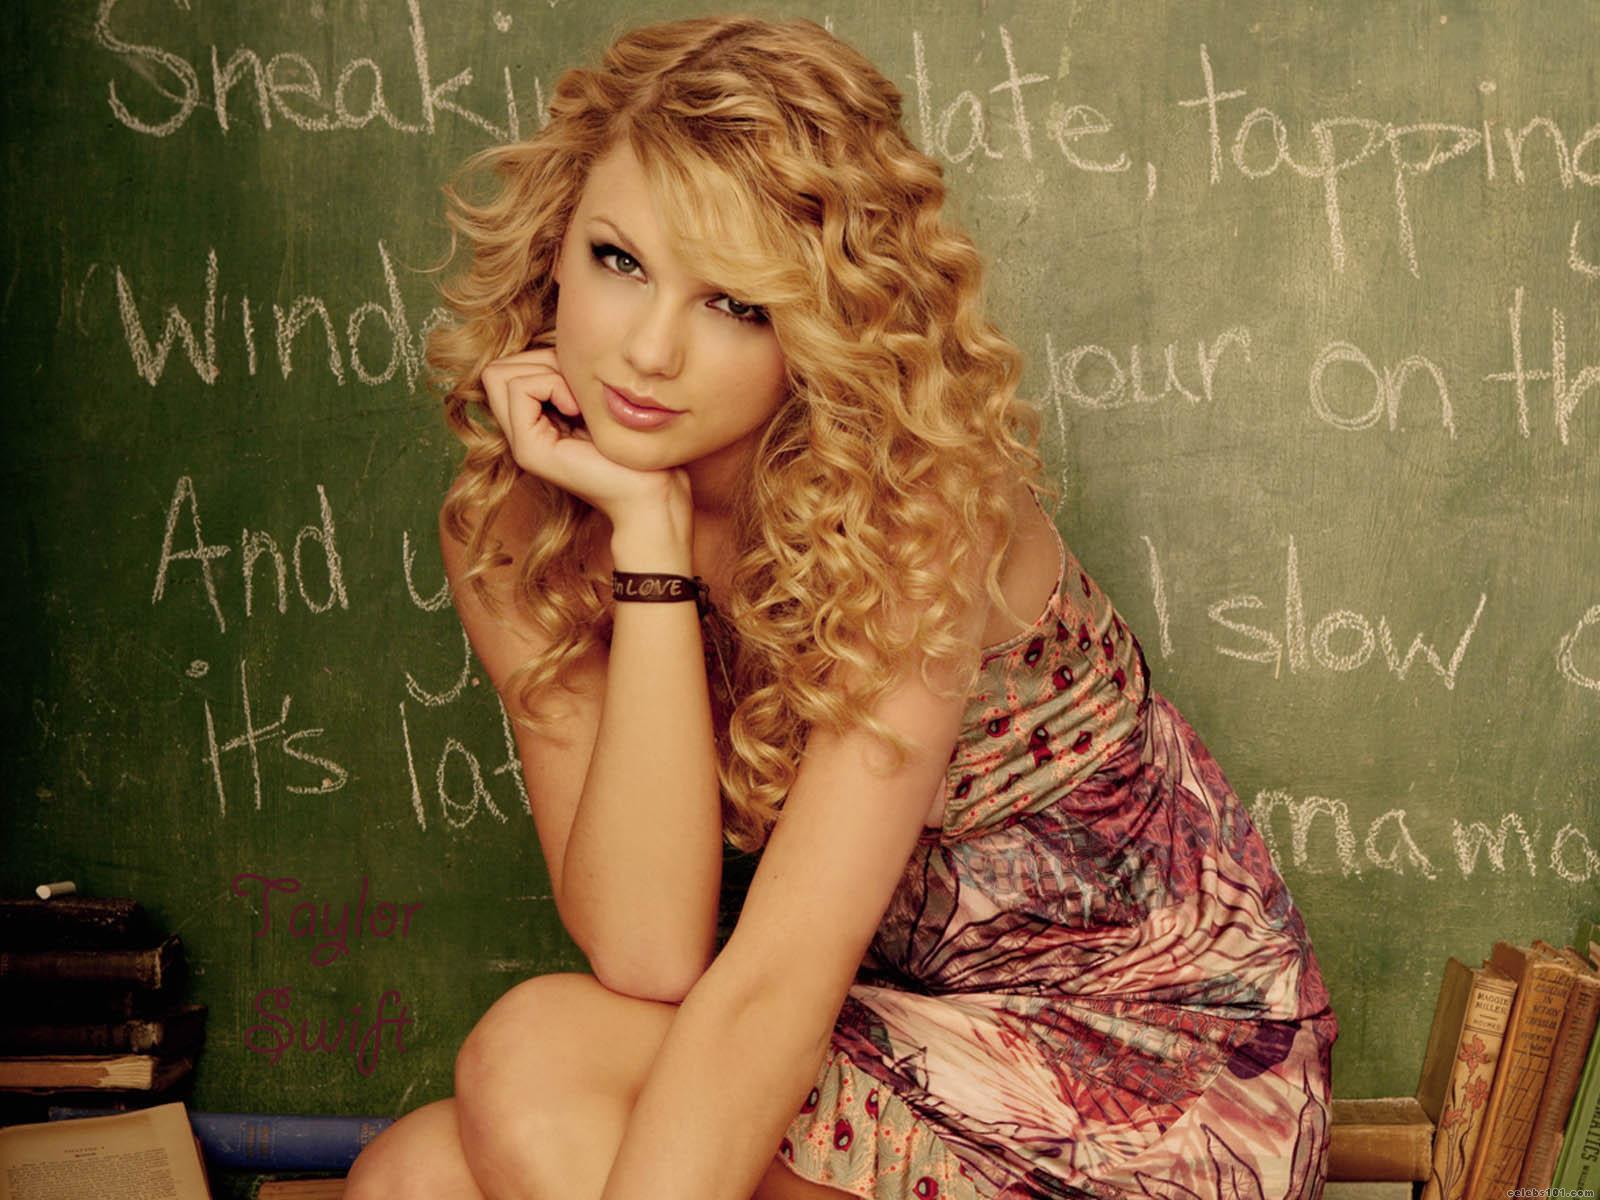 Taylor Swift Wallpaper Pack 5 Cute Girls Celebrity Wallpaper 1600x1200